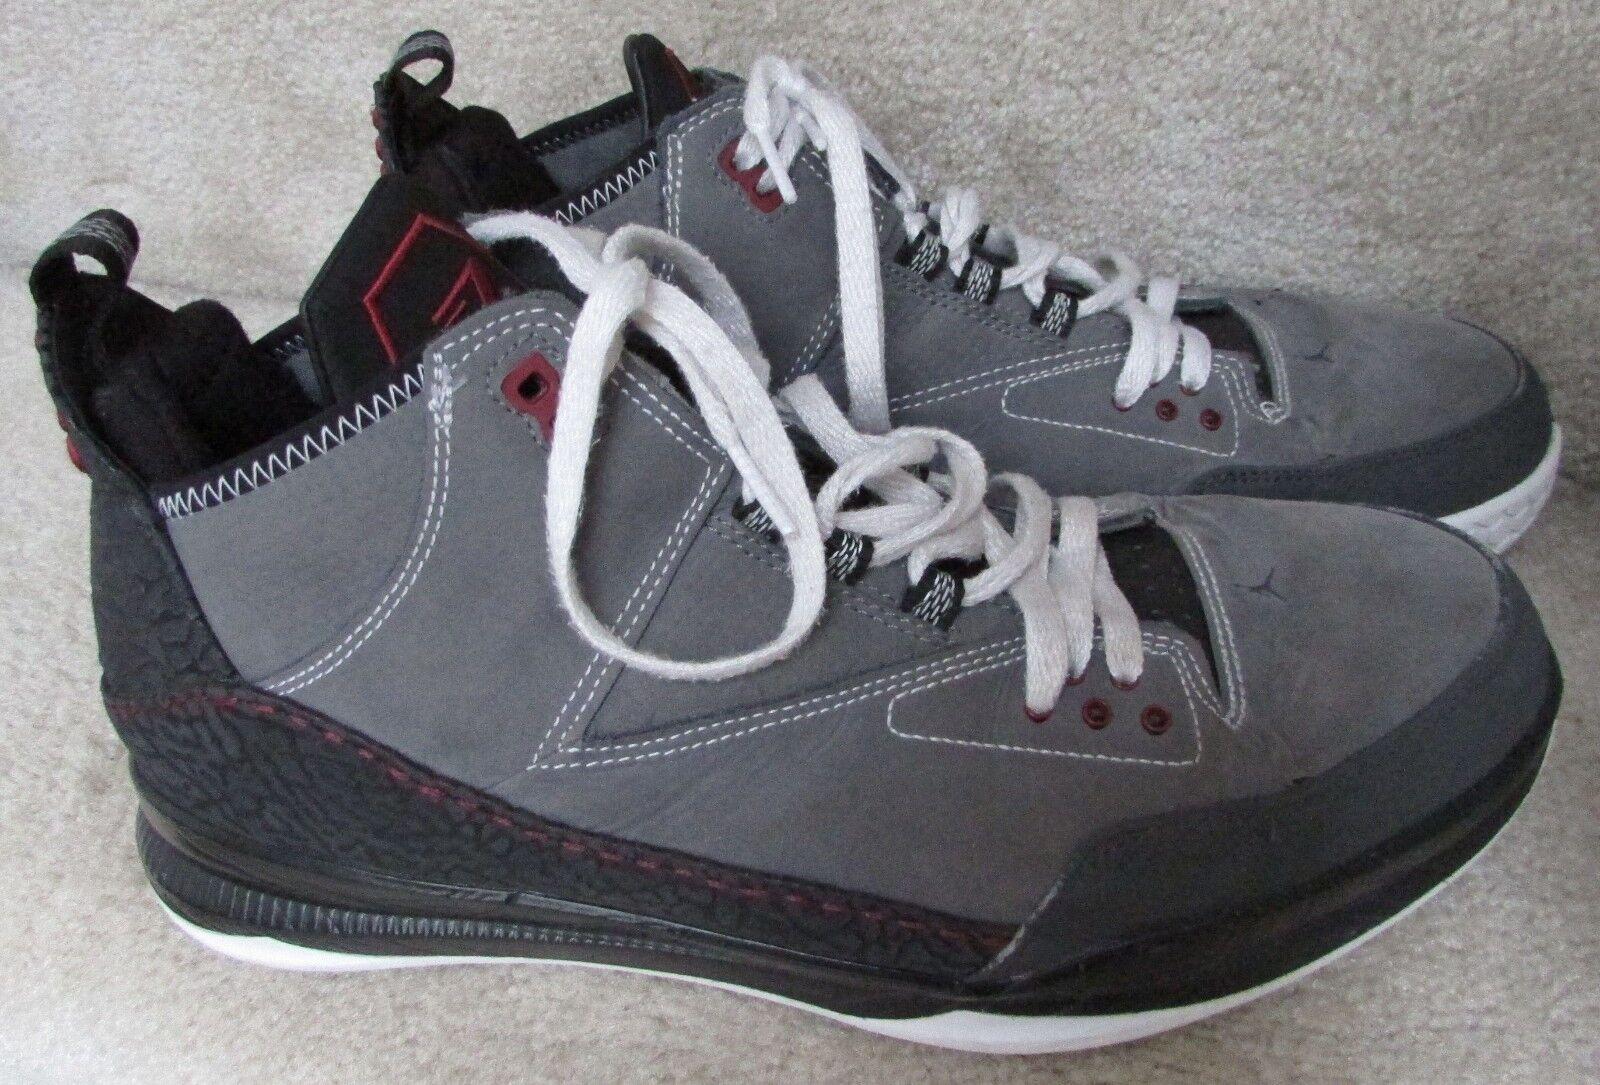 2018 Homme Nike Jordan CP3 Tribute Basketball Chaussures 407451 003